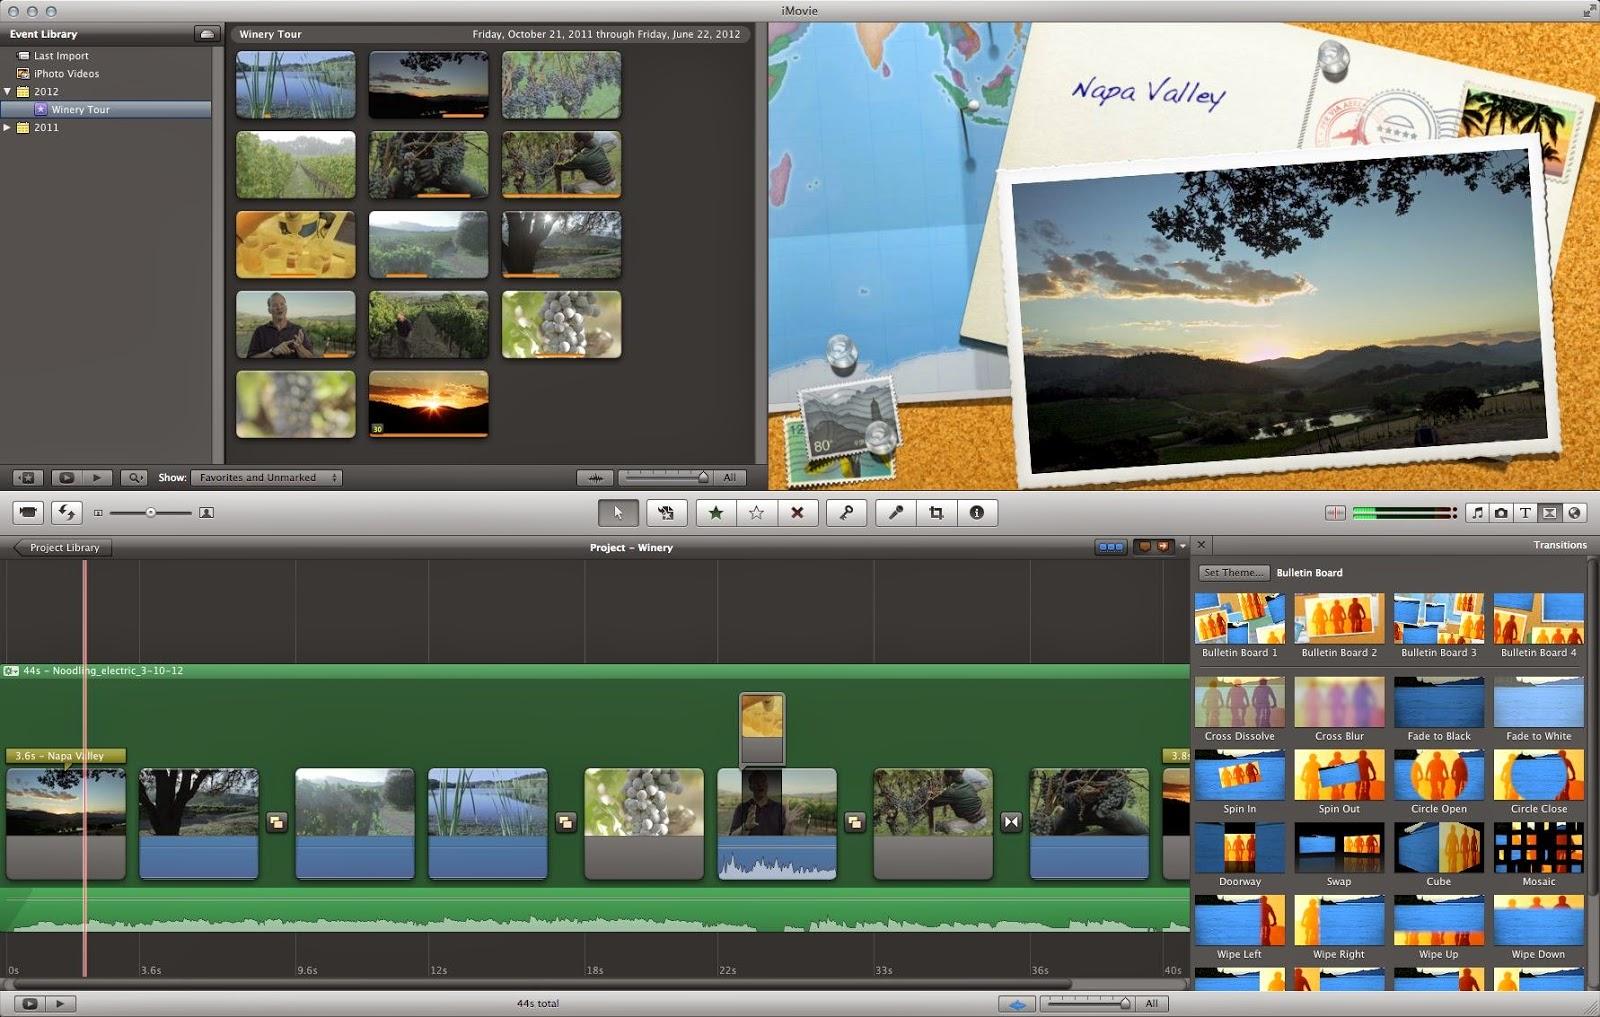 Good video editing software full version